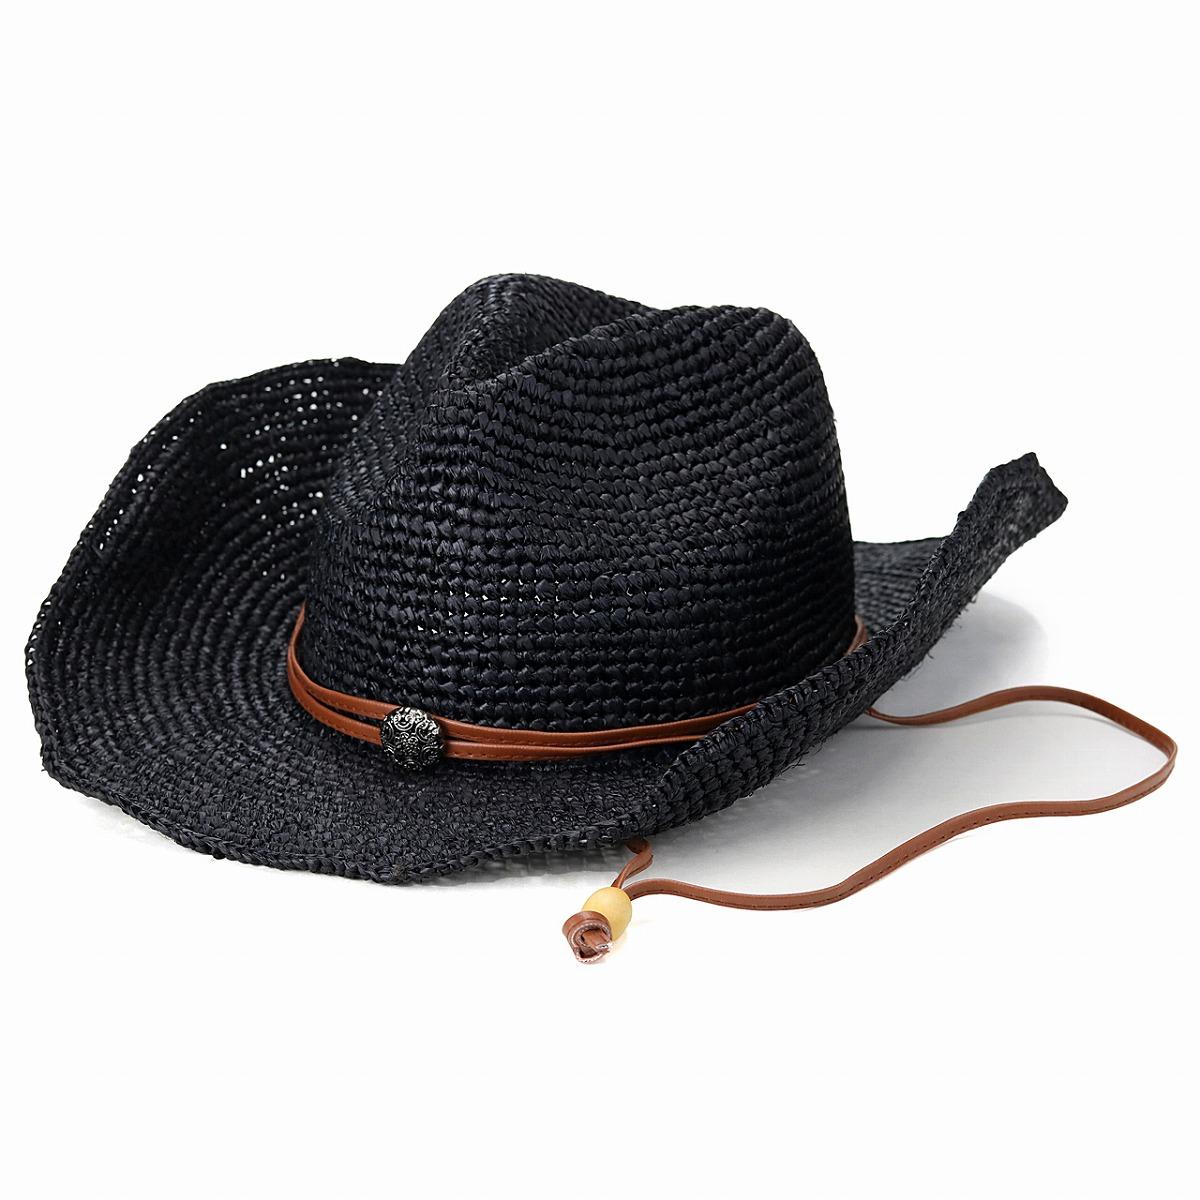 ... Stylish chin strap awning cowboy natural black black  cowboy hat    straw hat  ... 4b99259b67c